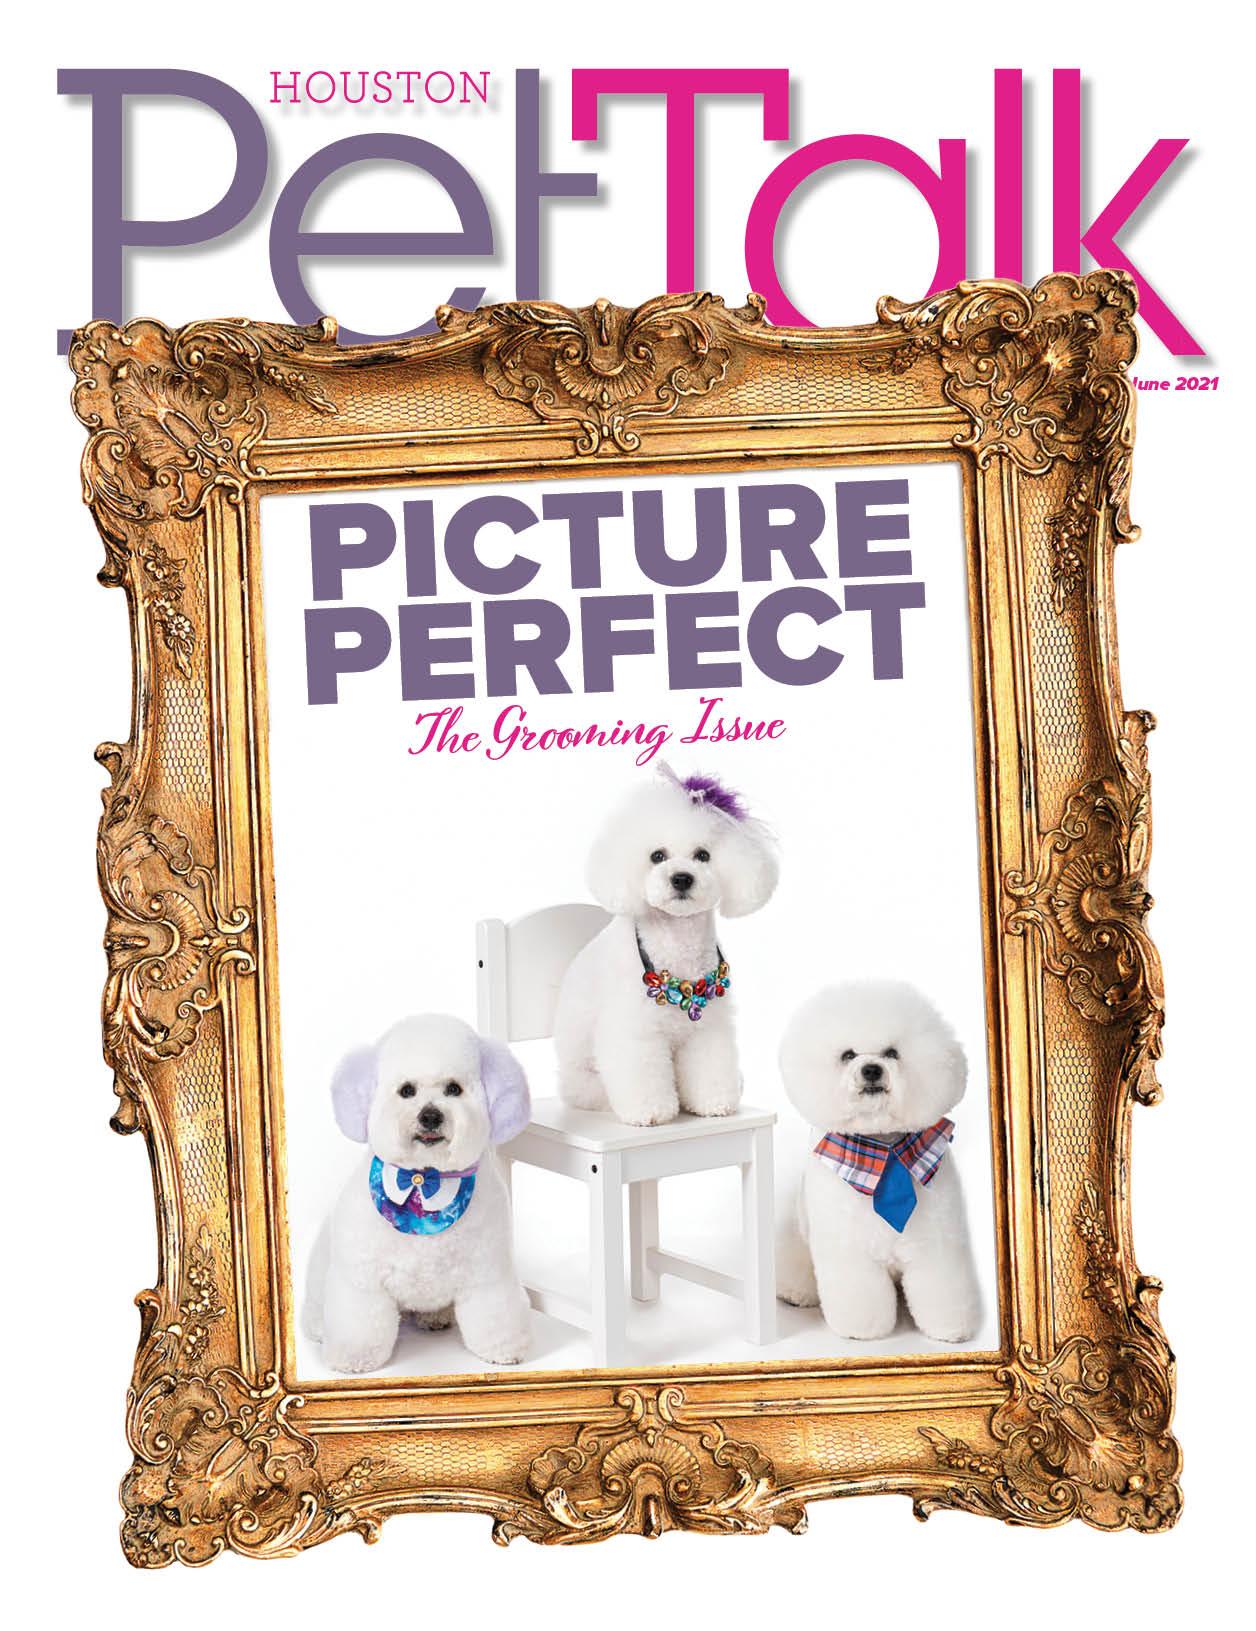 June 2021 Digital Issue of Houston PetTalk